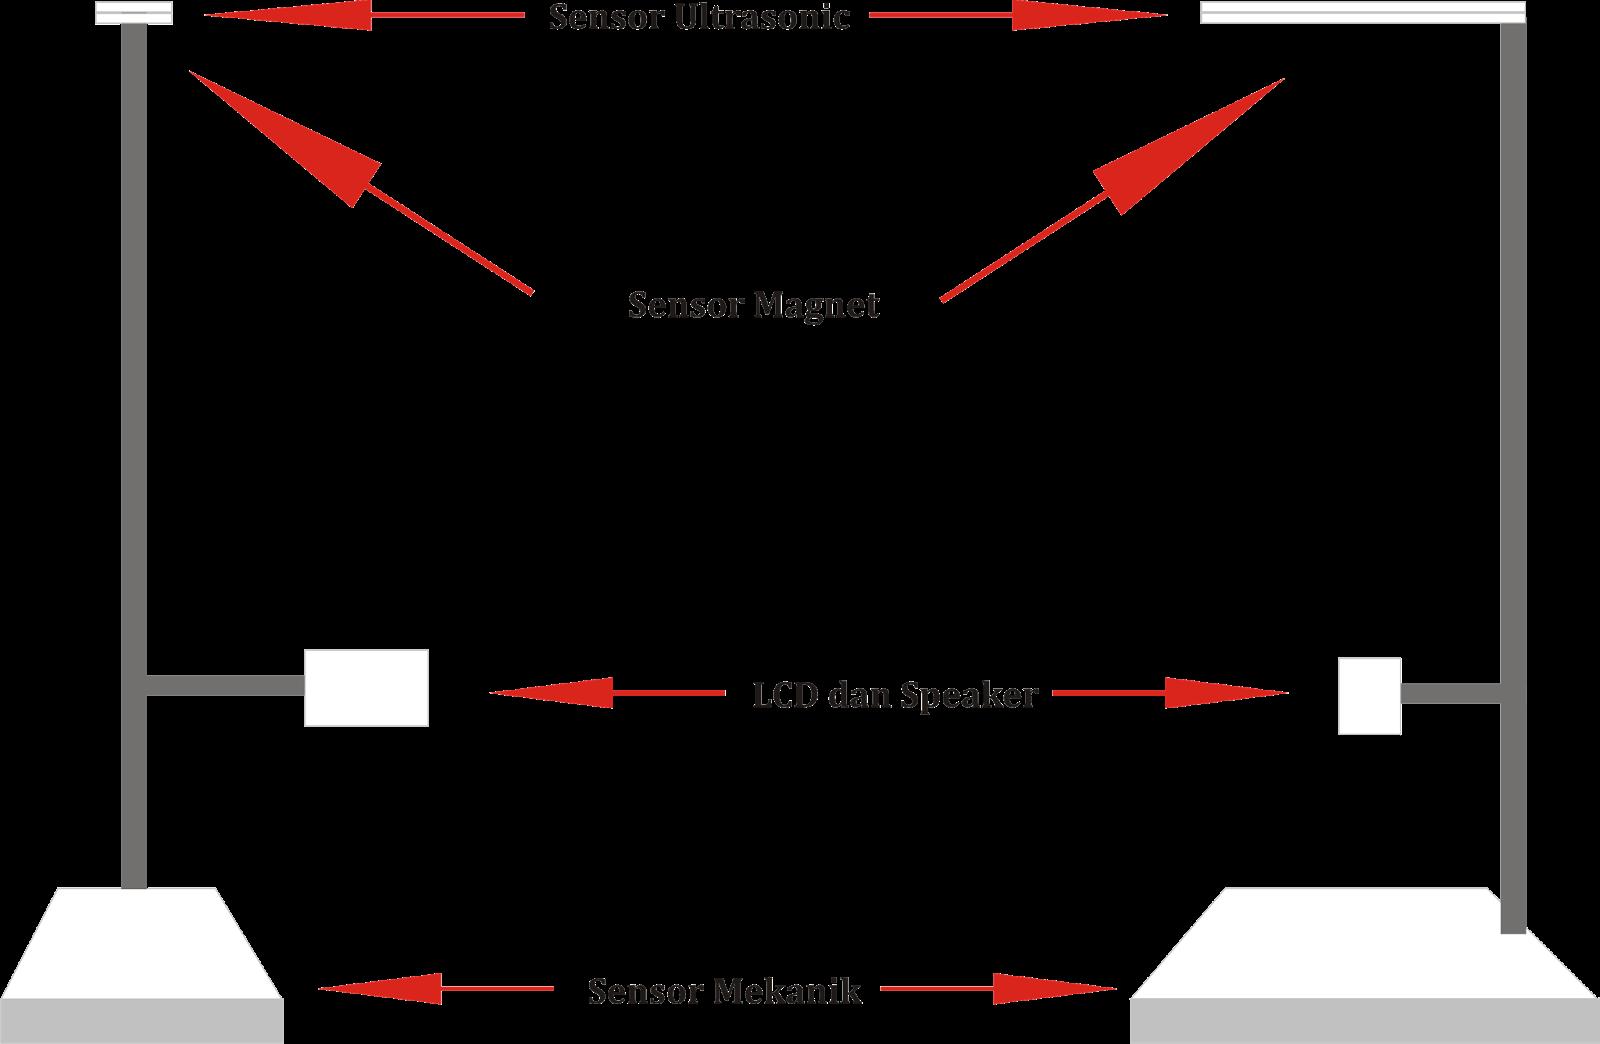 BBM 1 (Besaran dan Pengukuran) KD Fisika - File UPI